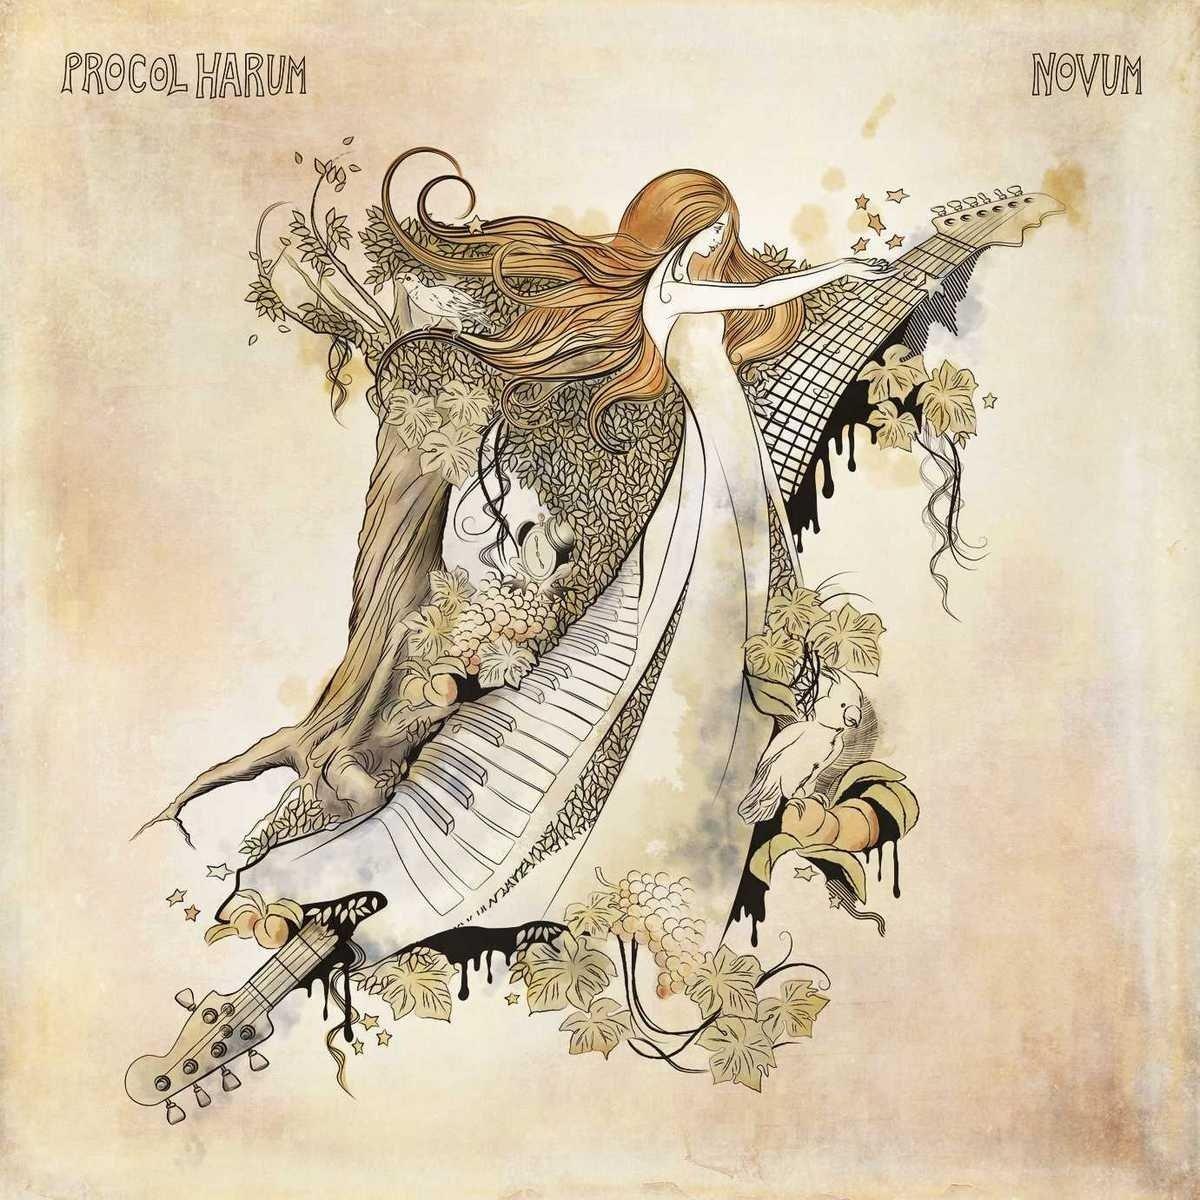 Novum by Procol Harum image